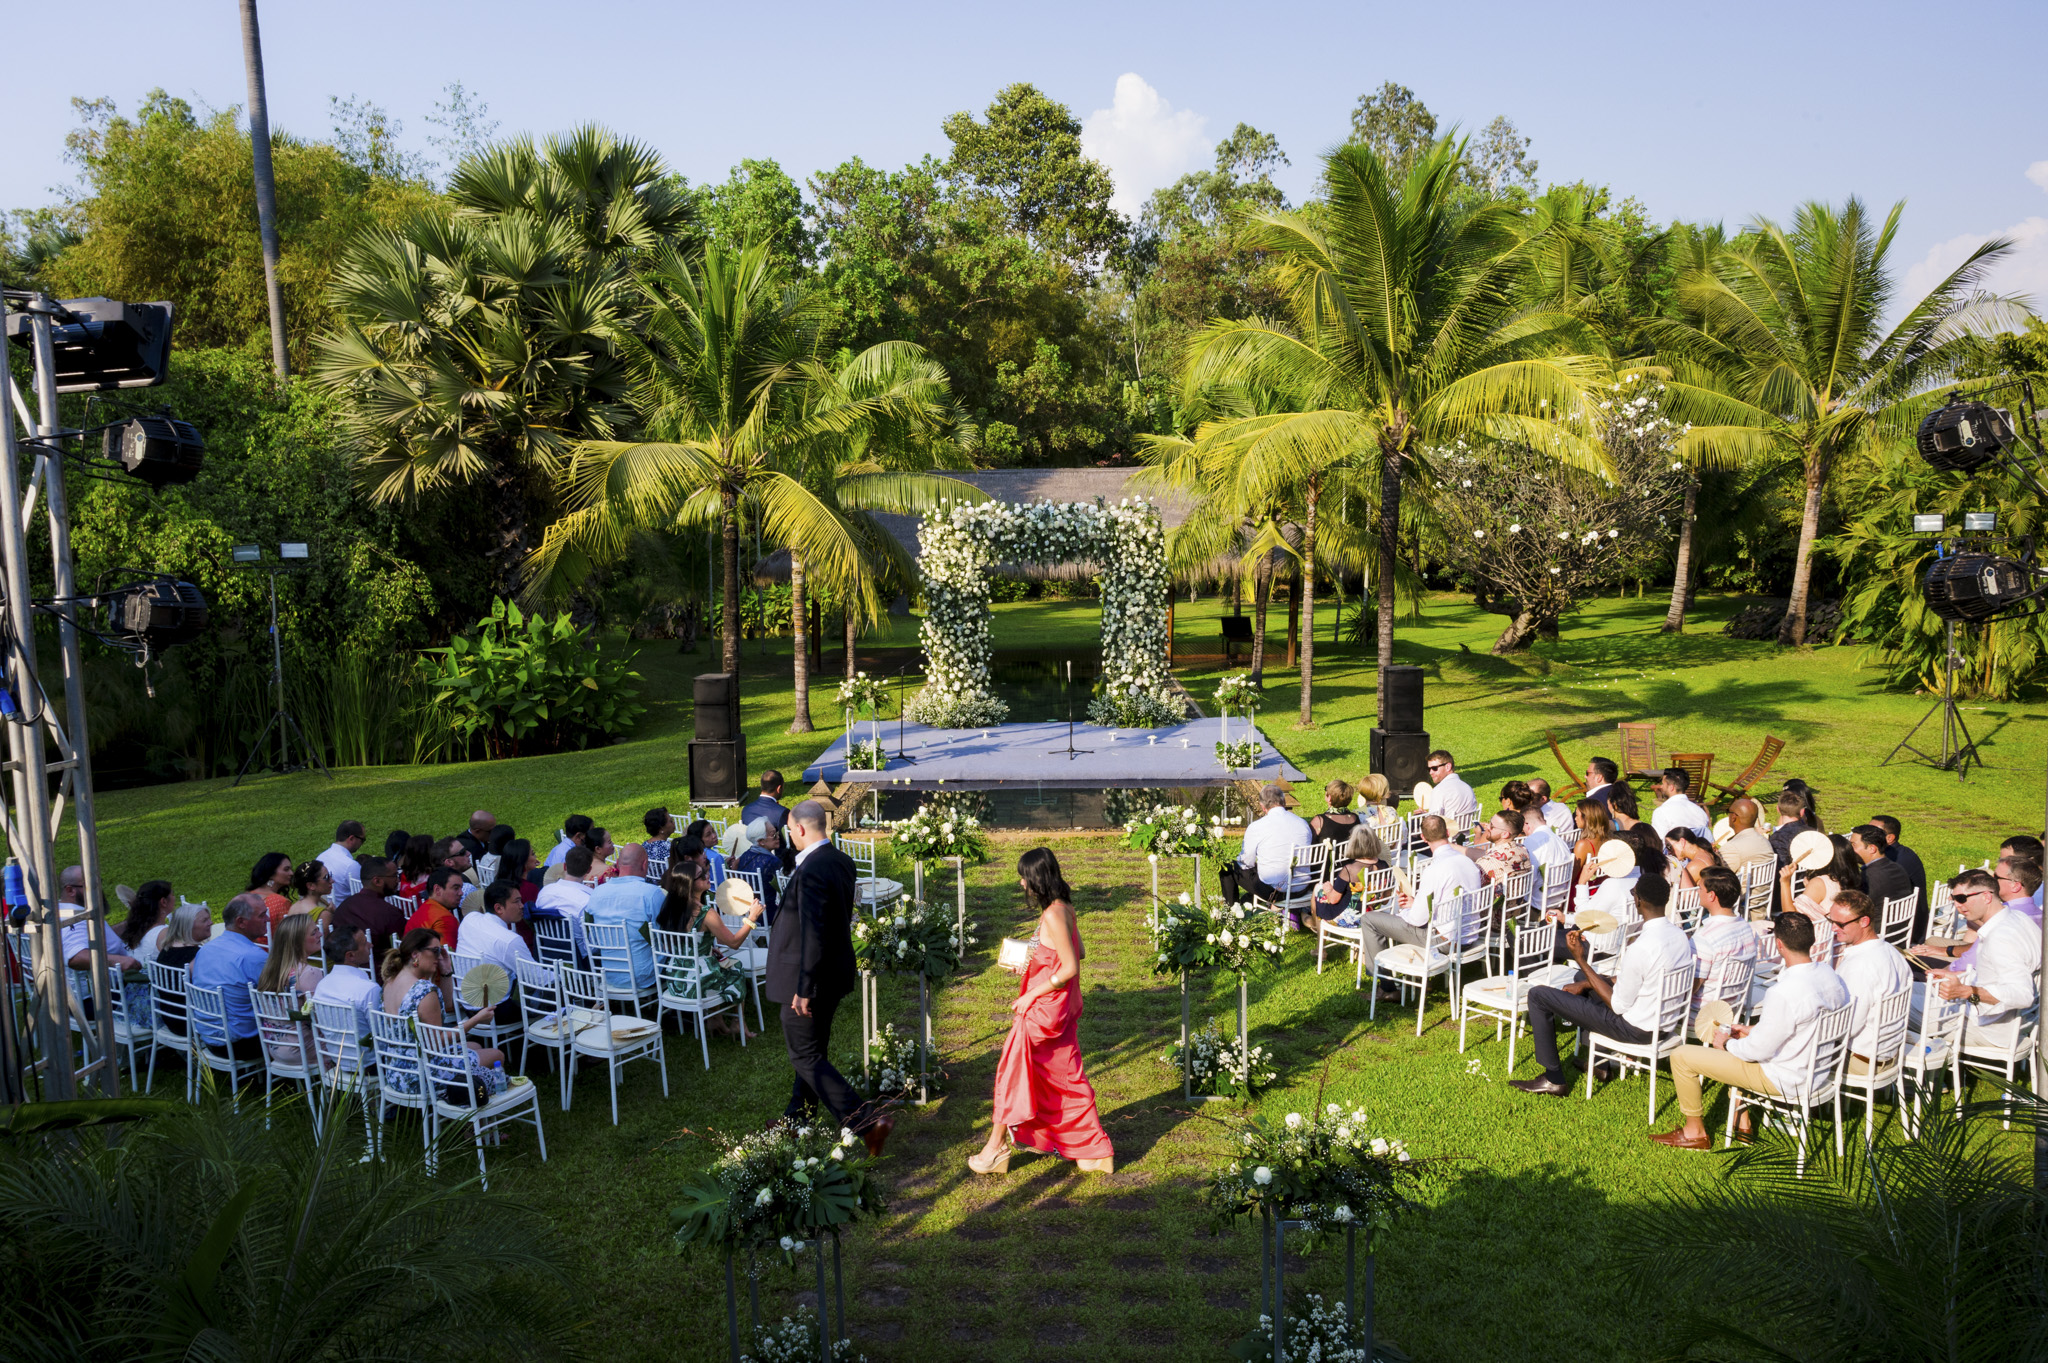 Khoi Le Studios Wedding Photojournalism (Wedding in Campodia)_21.jpg